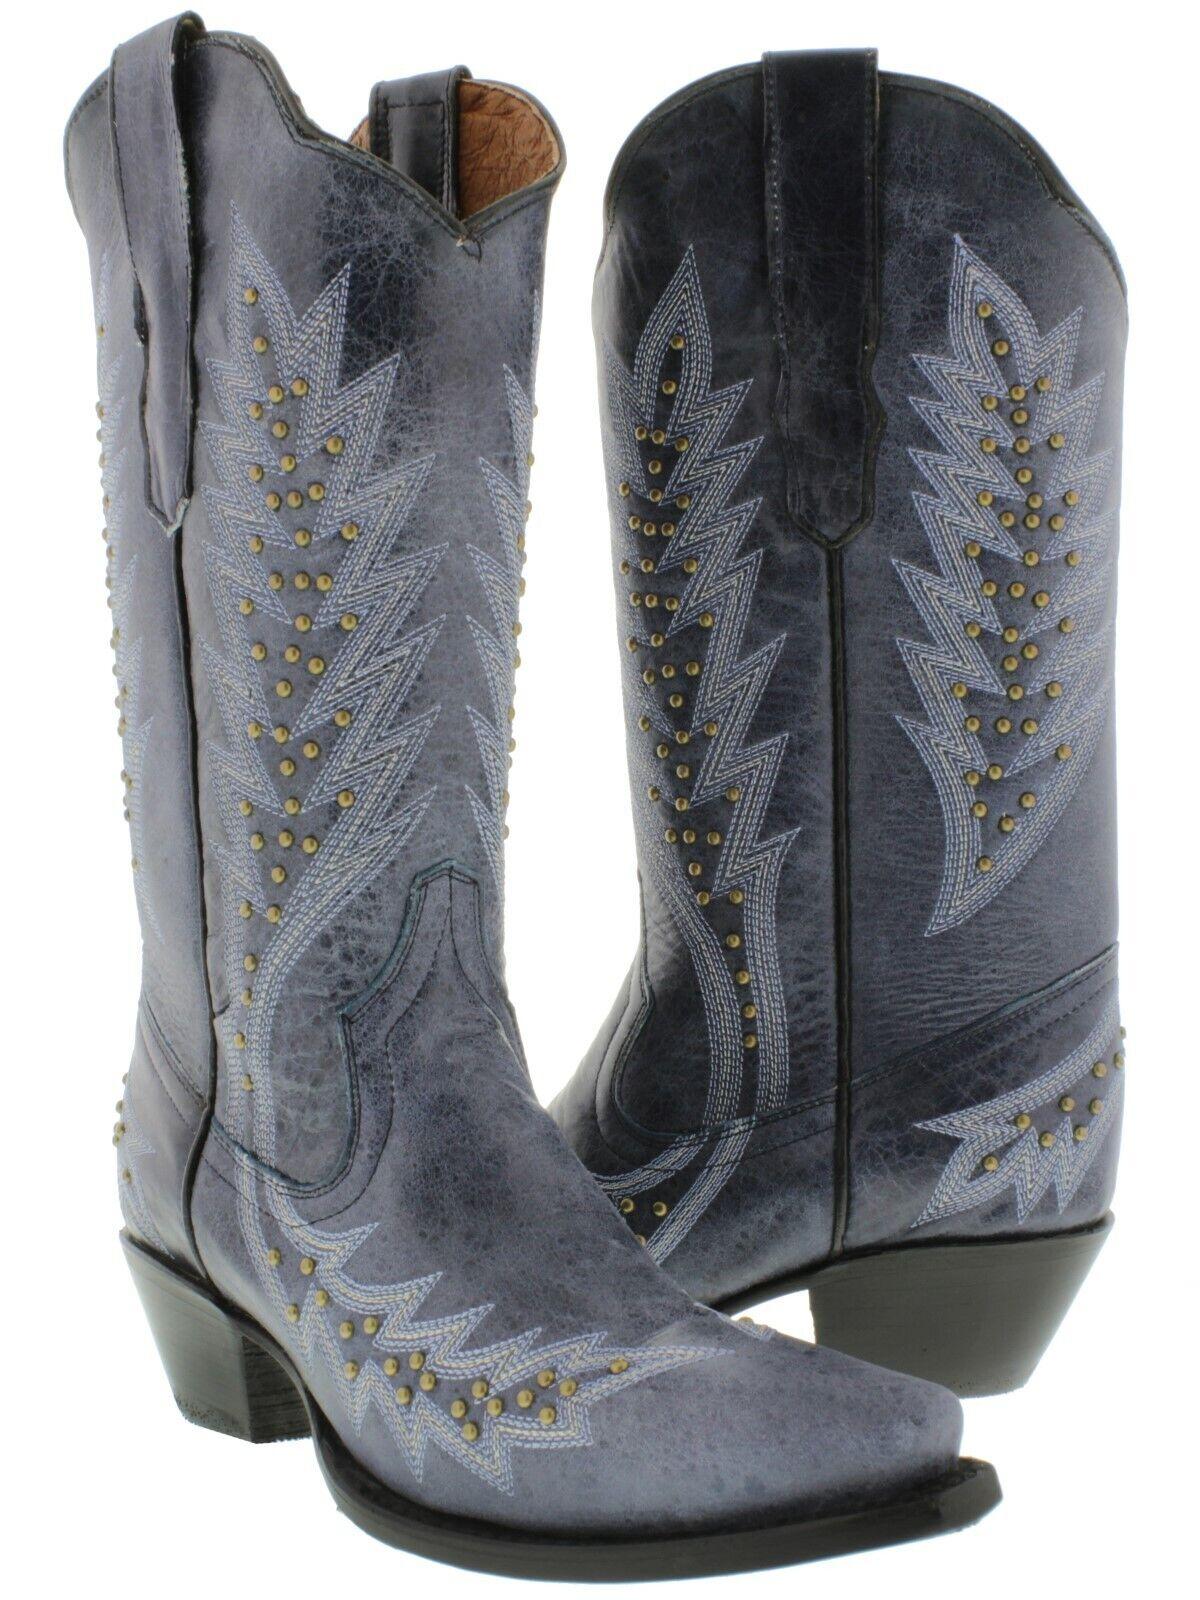 kvinnor Denis blå Studded Cowgirl stövlar guld Genuine läder Sniper Toe Storlek 5.5